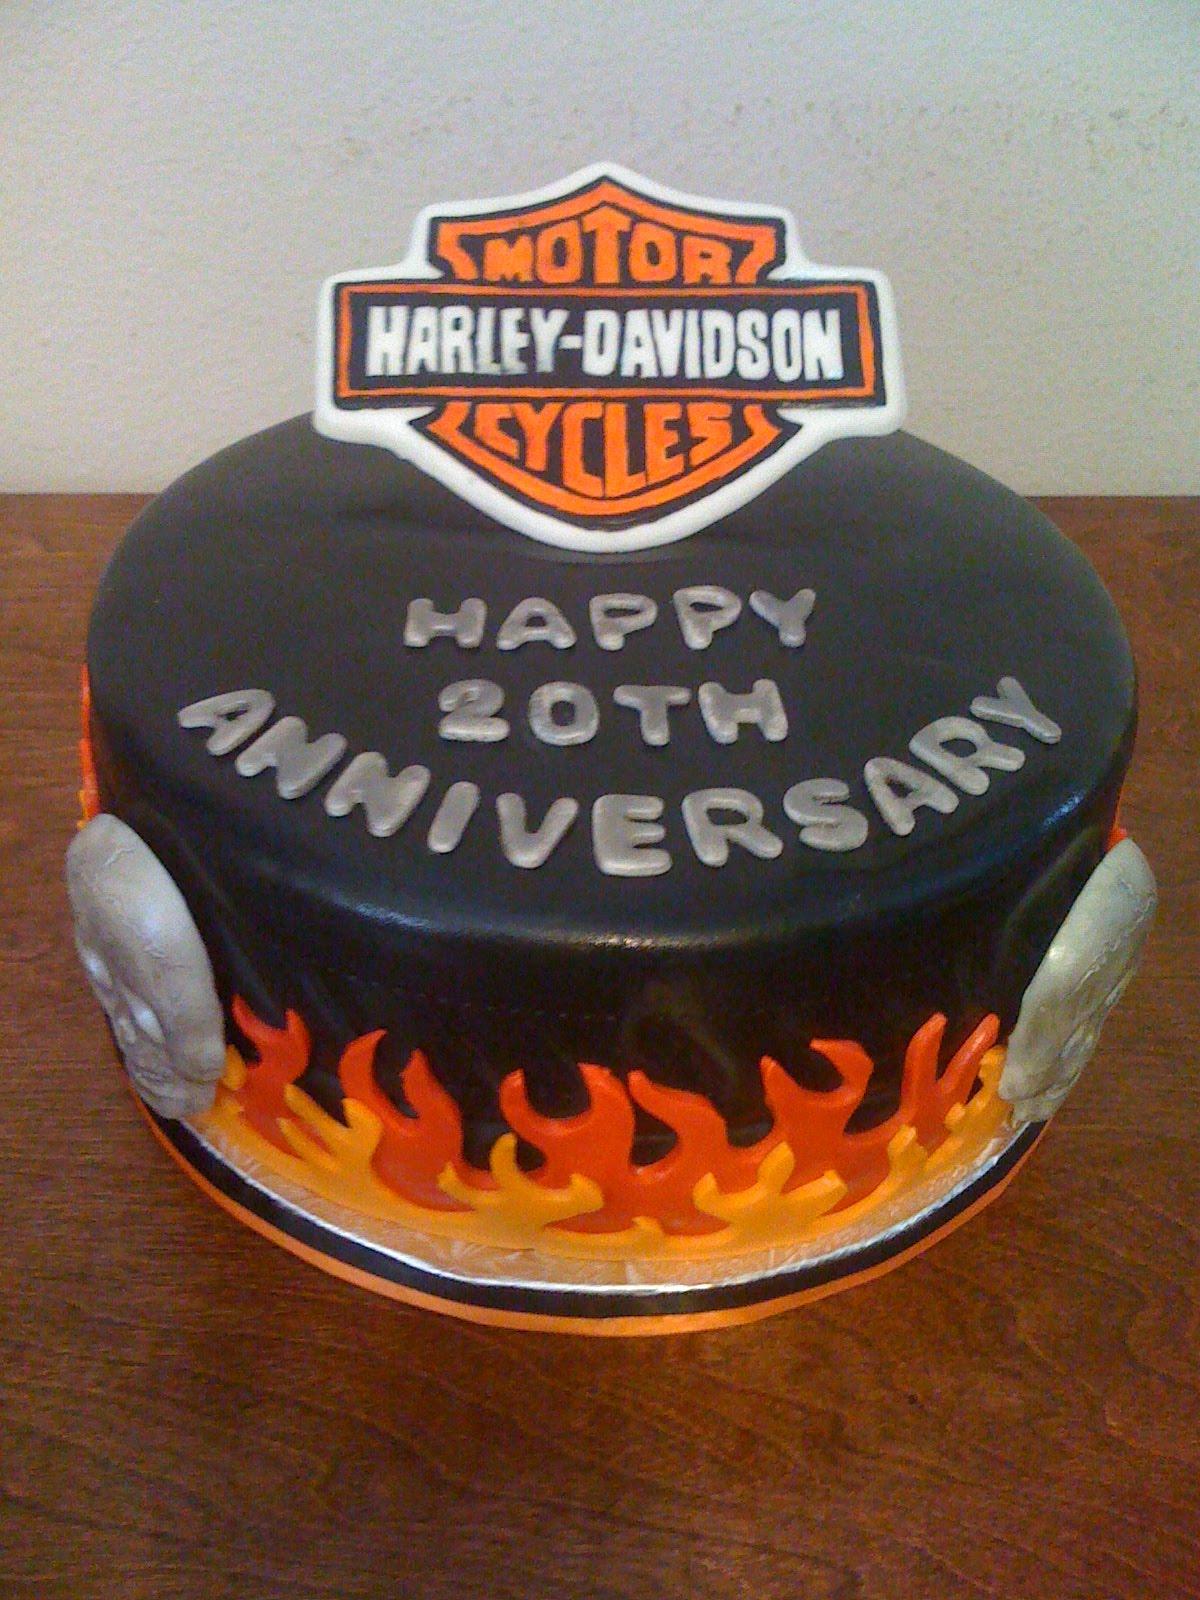 Harley-Davidson Cakes